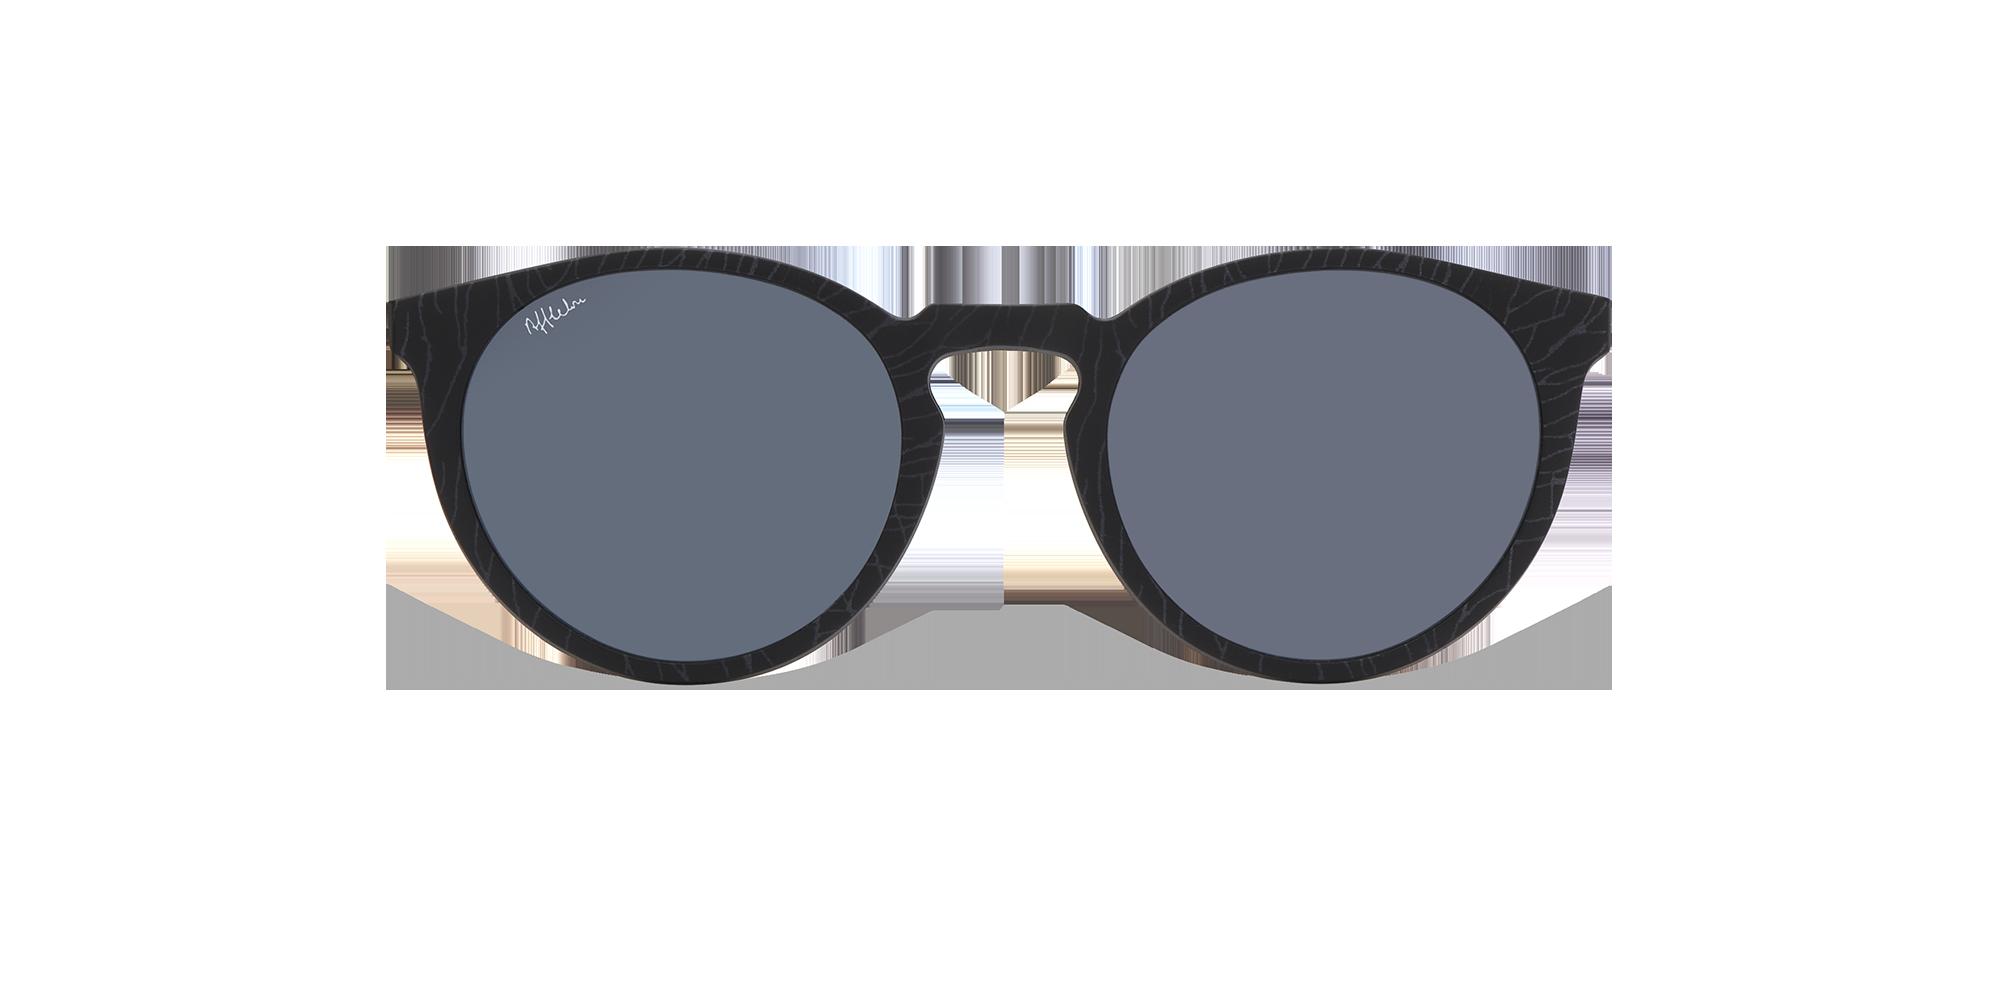 afflelou/france/products/smart_clip/clips_glasses/TMK35SUBK014820.png